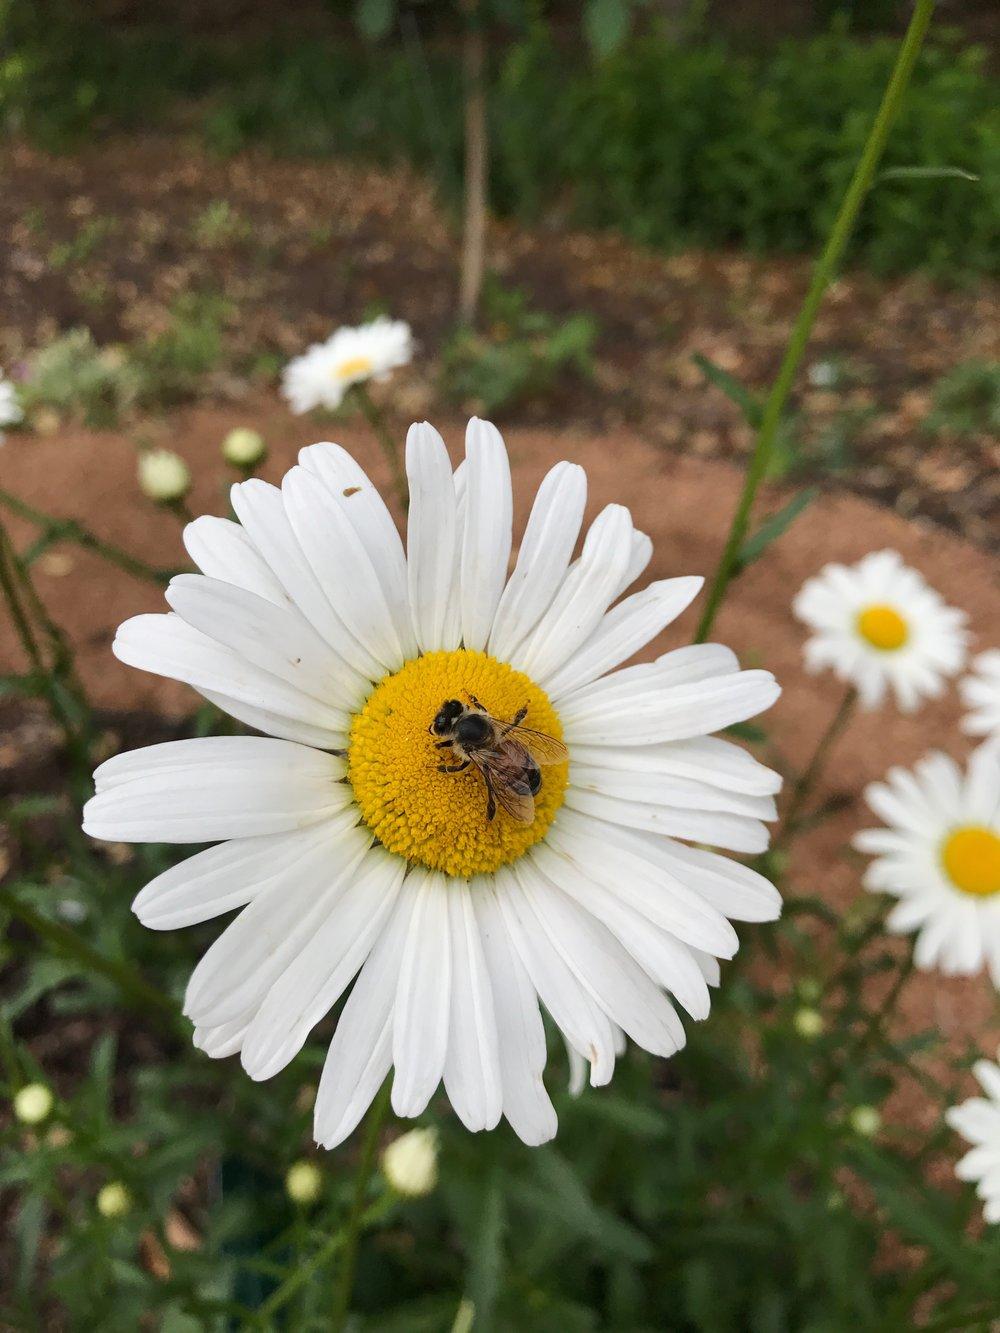 Honeybee on an Ox-eye Daisy